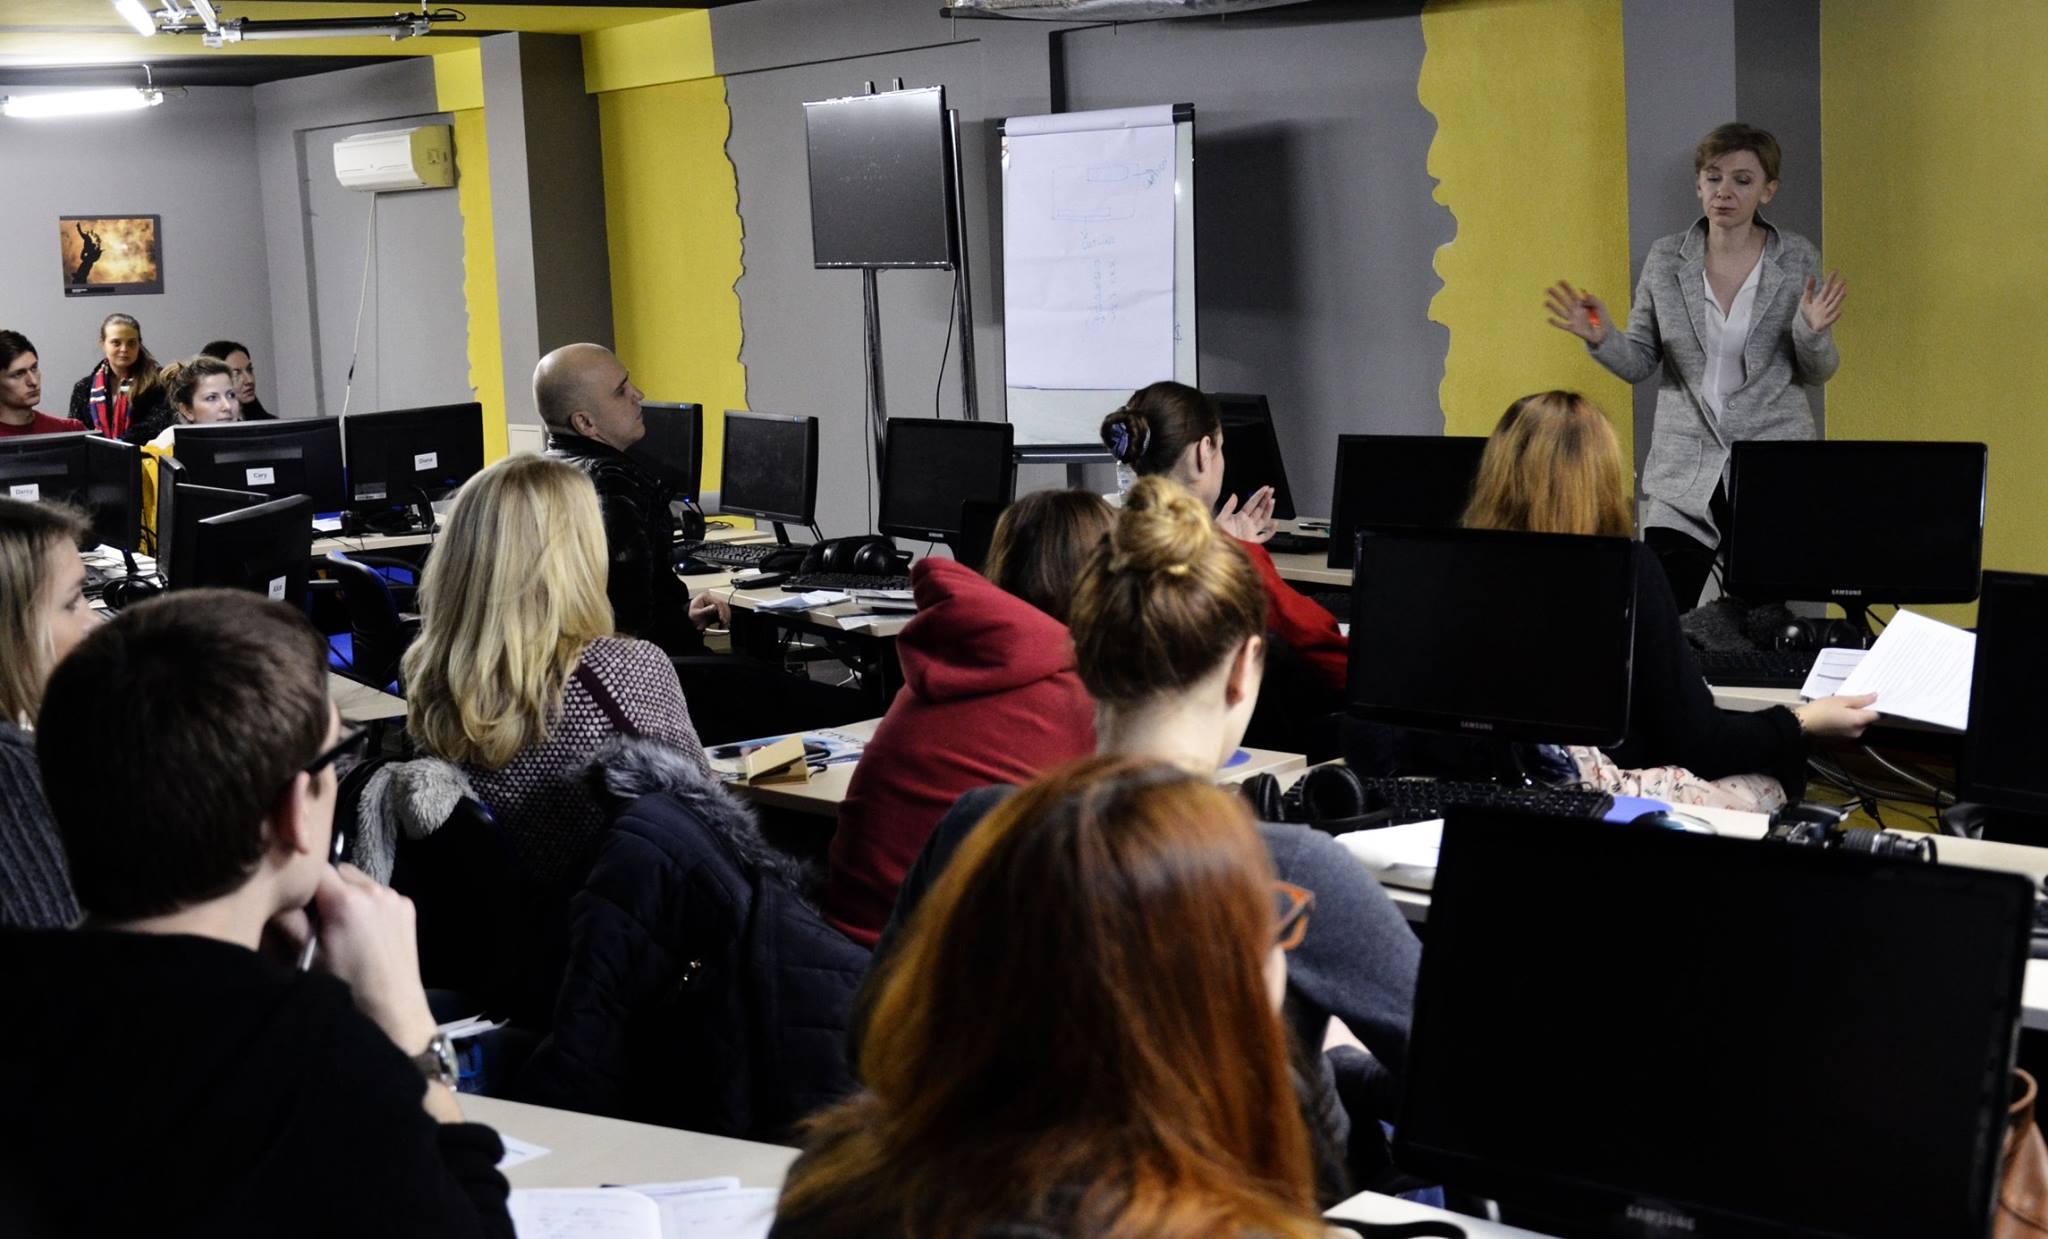 Hromadske CEO Katya Gorchinskaya leads a course on media management at the SRJ